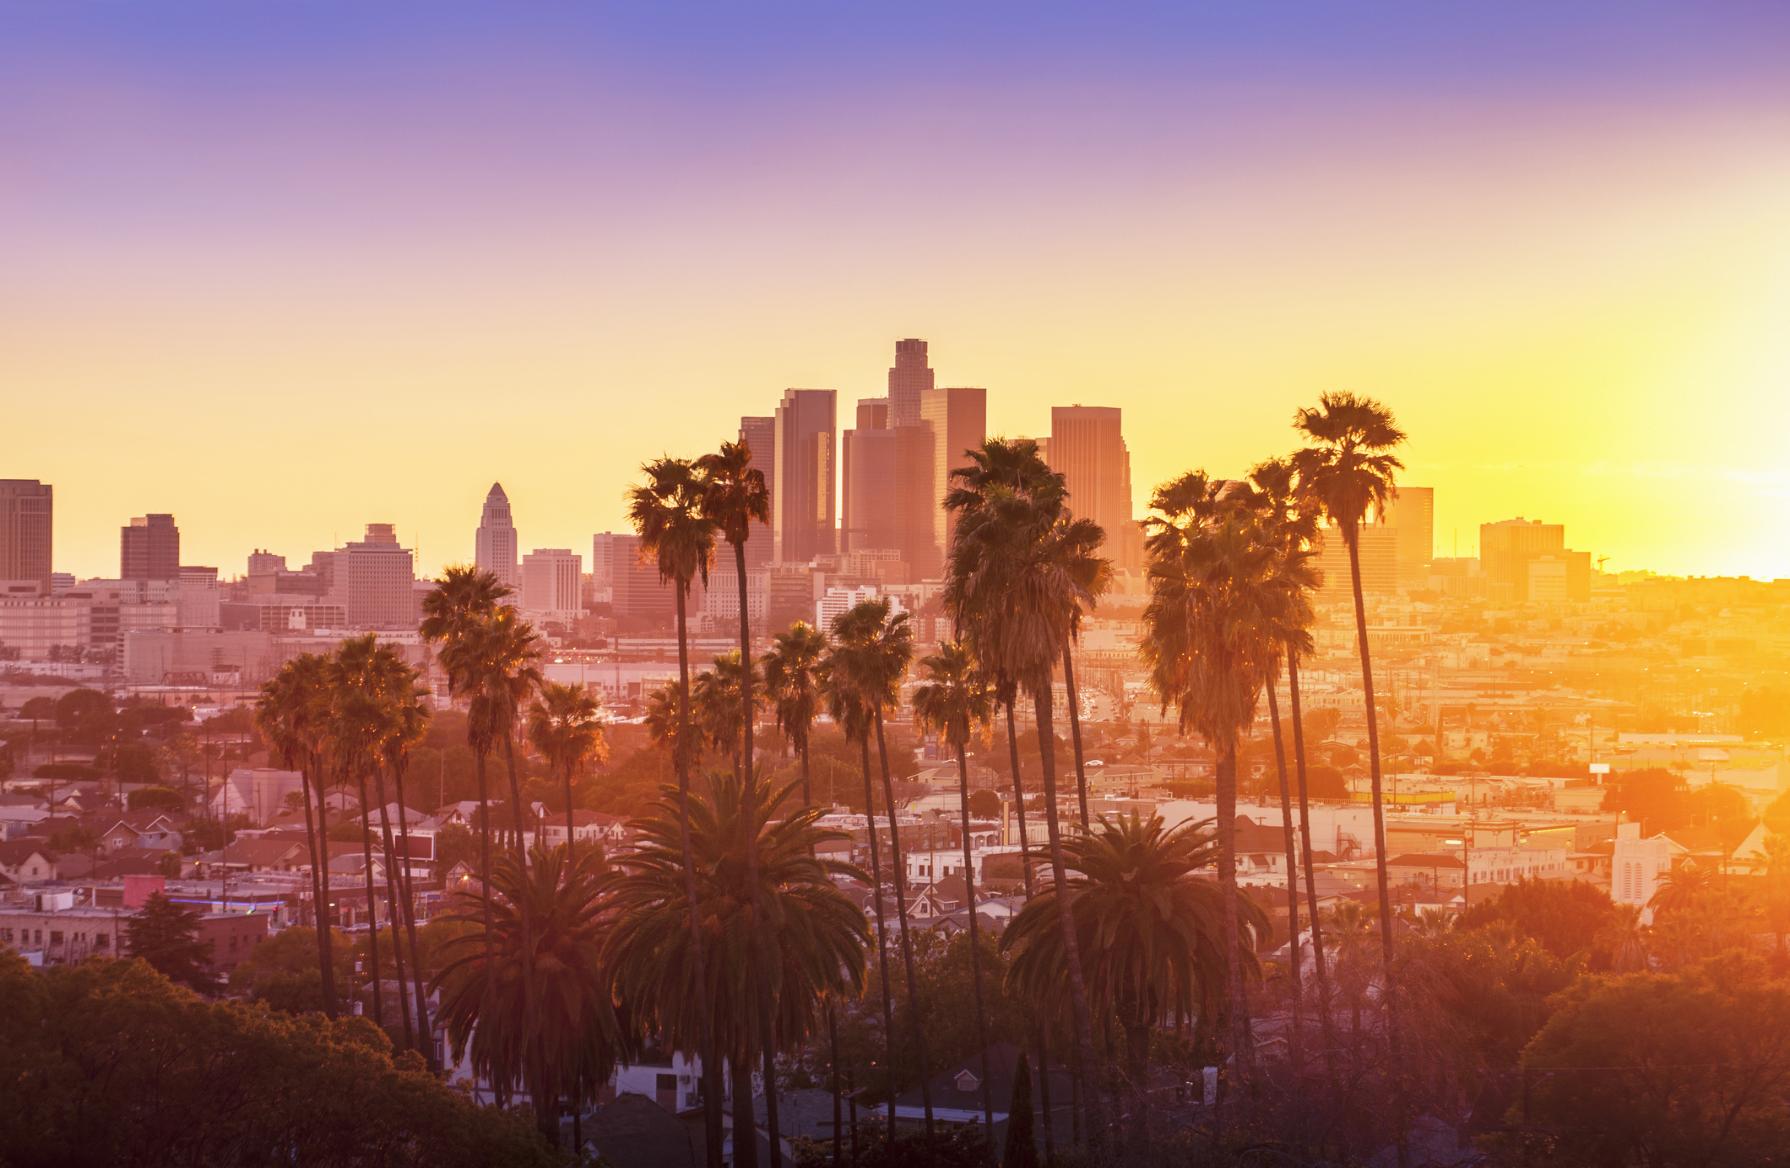 Hero_35 places to spot celebrites in LA_edit.jpg